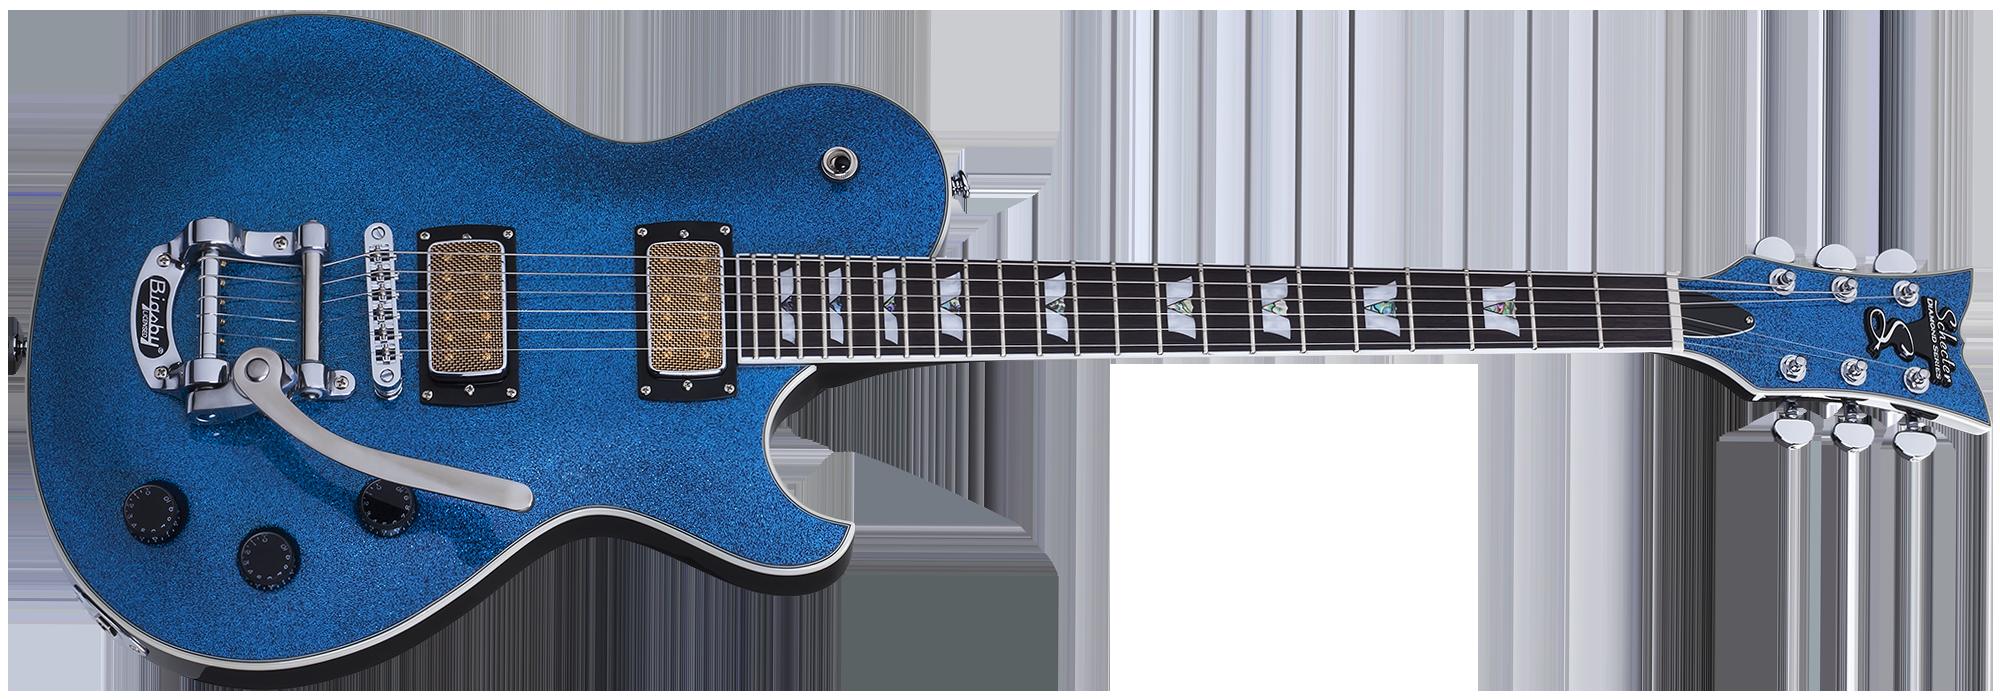 Solo-6B Blue Sparkle (BLU S) SKU #175